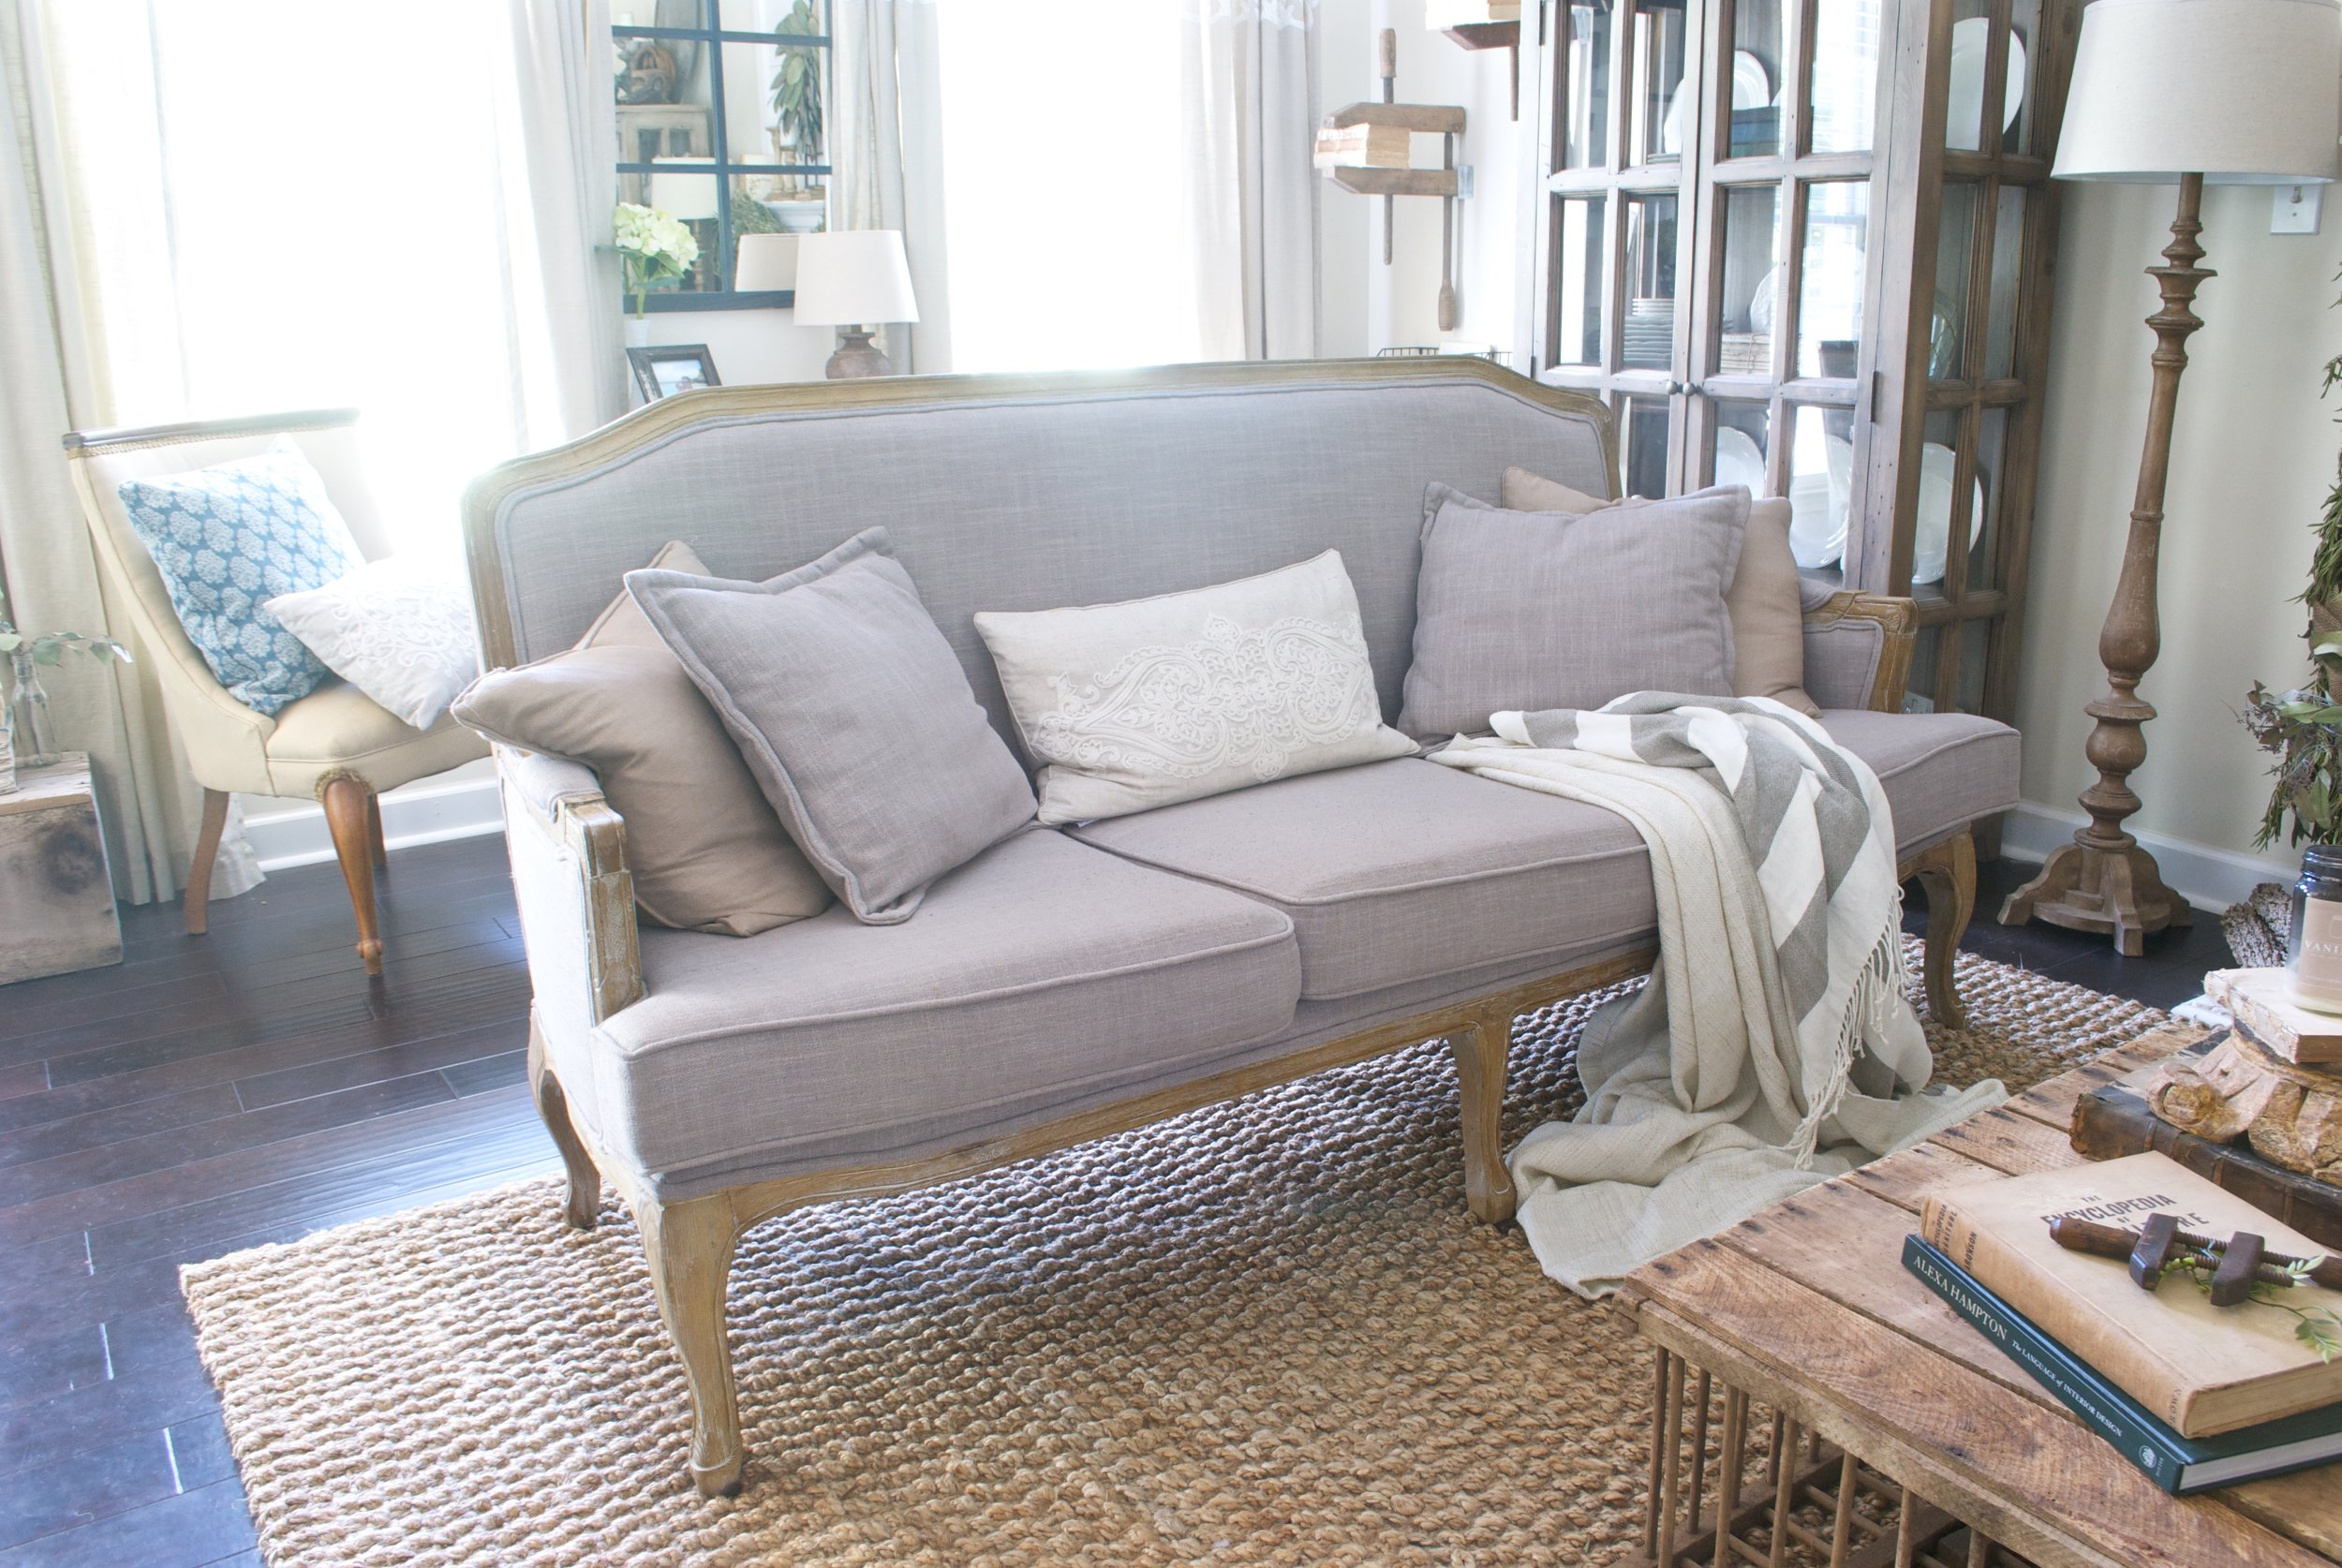 Plum Pretty Decor Amp Design CoMy Cozy French Farmhouse Living Room Im Giving You ALL The Sources